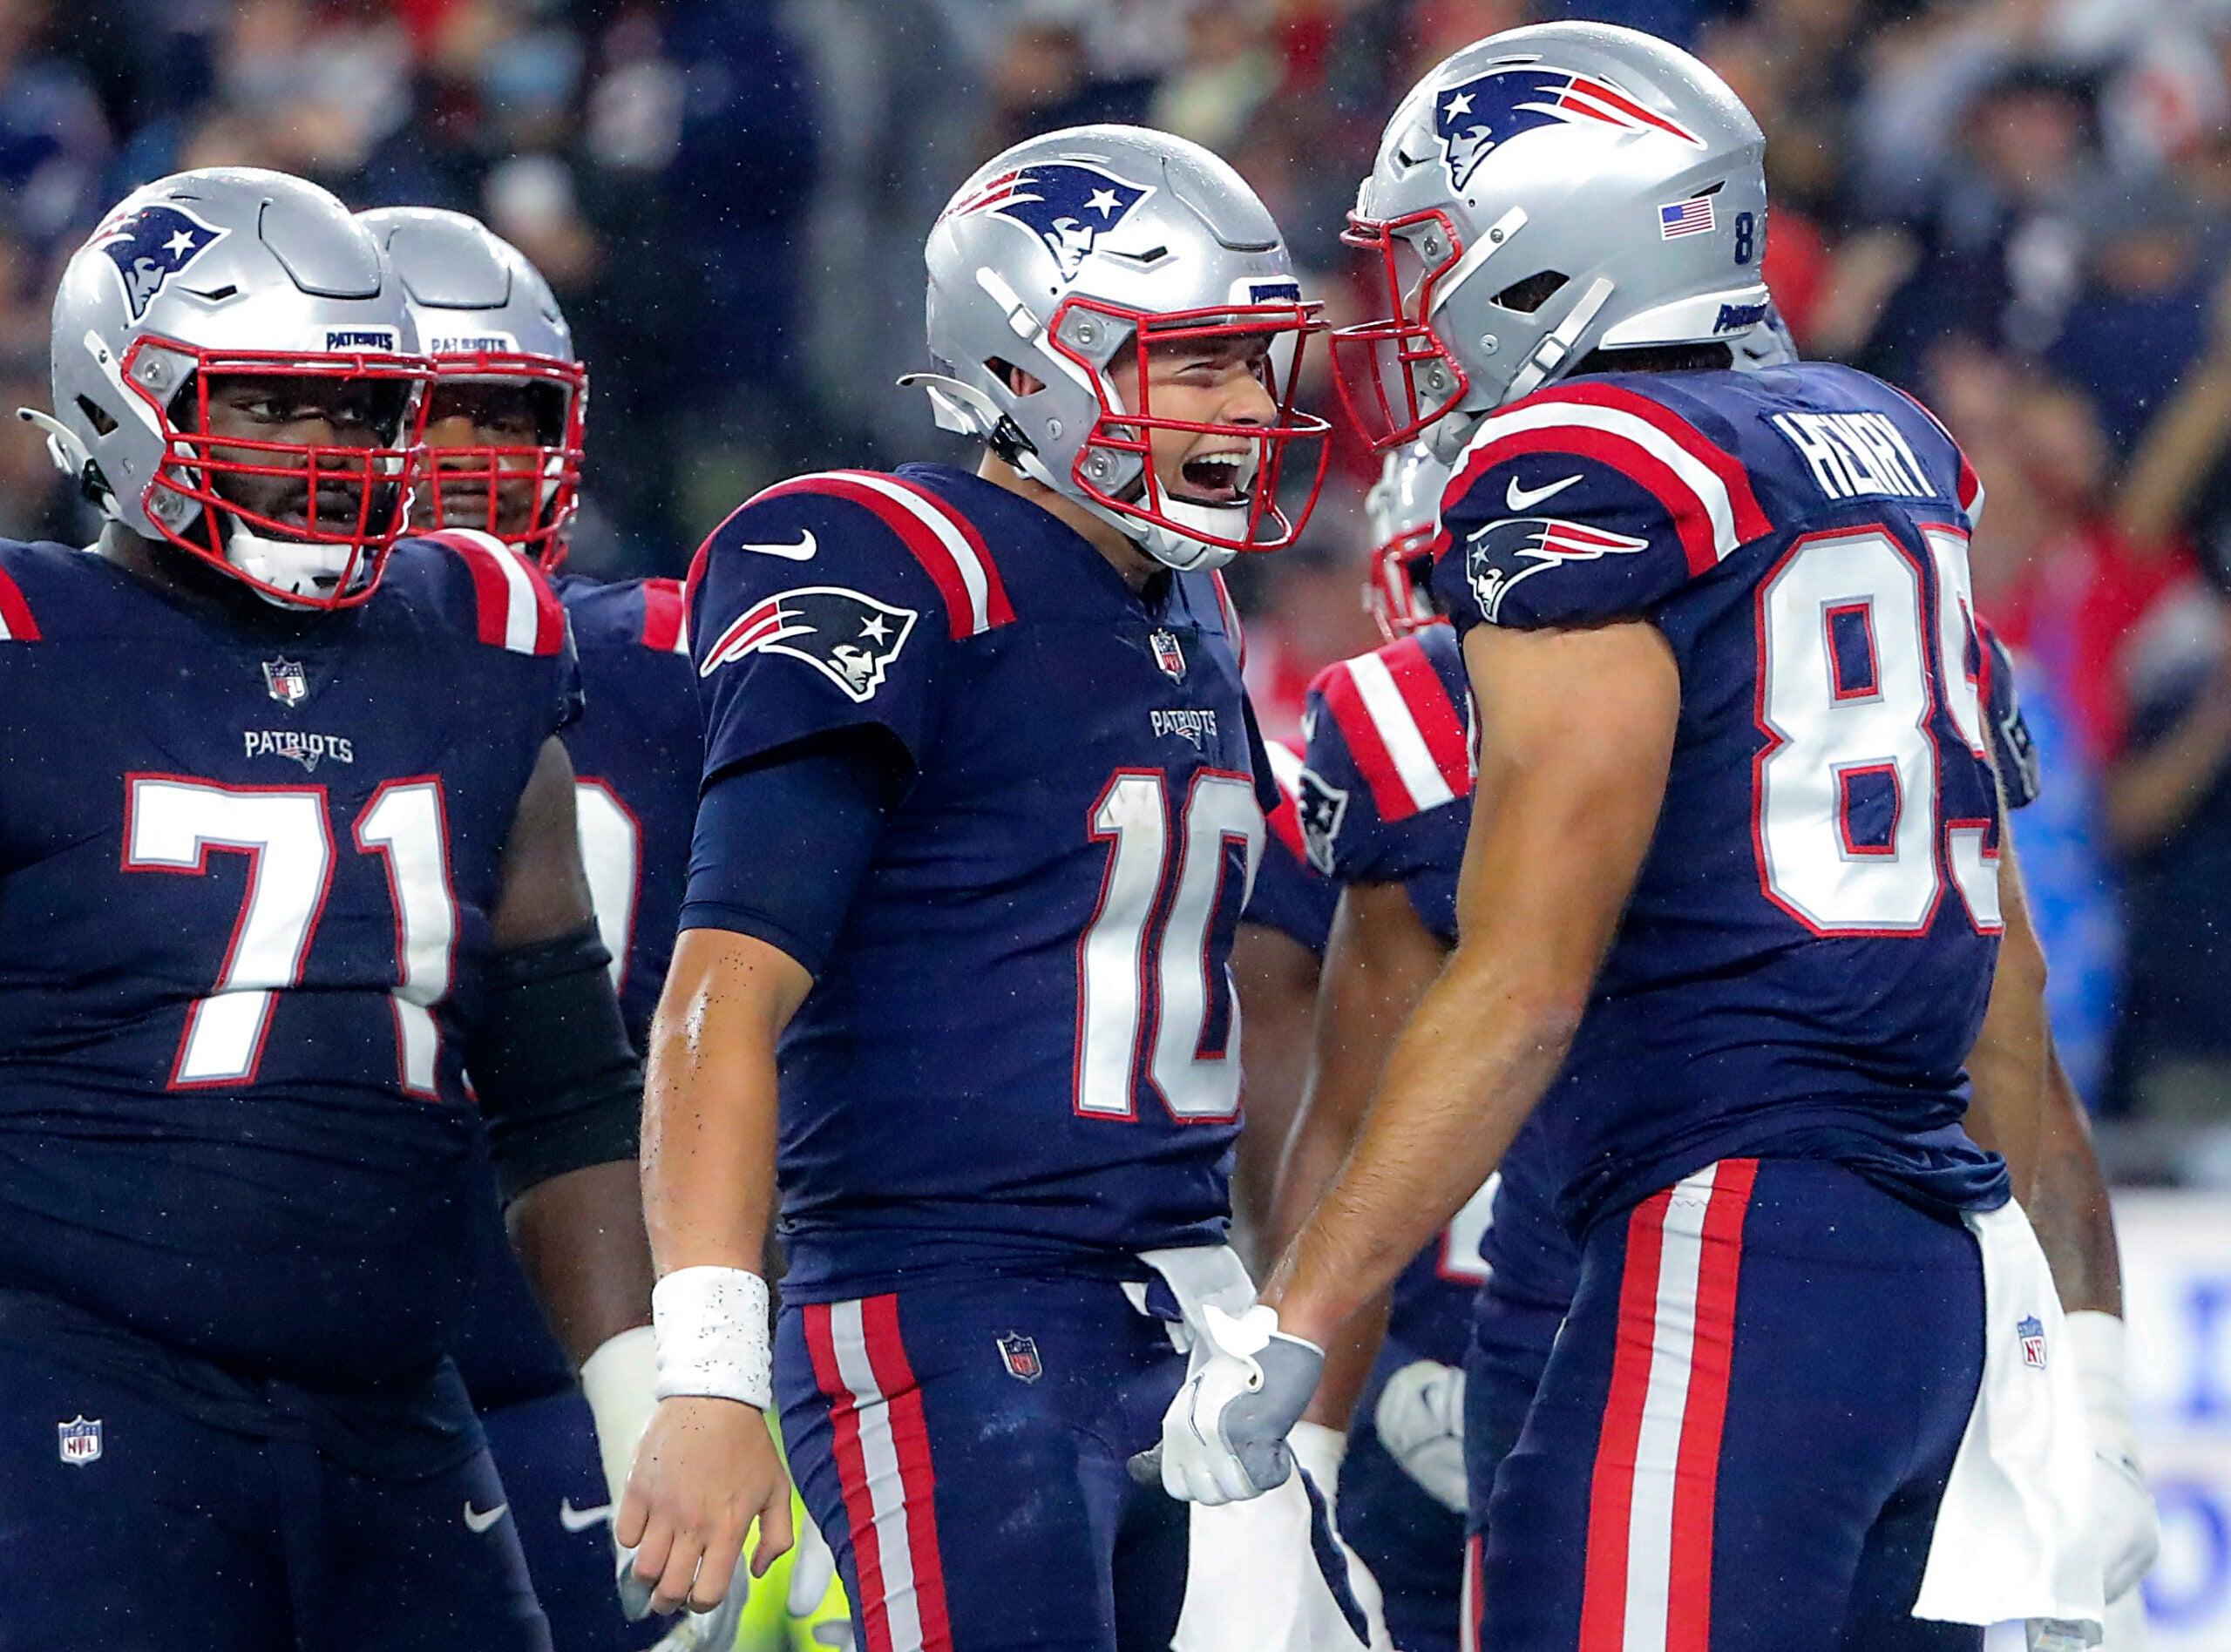 Patriots playoff chances